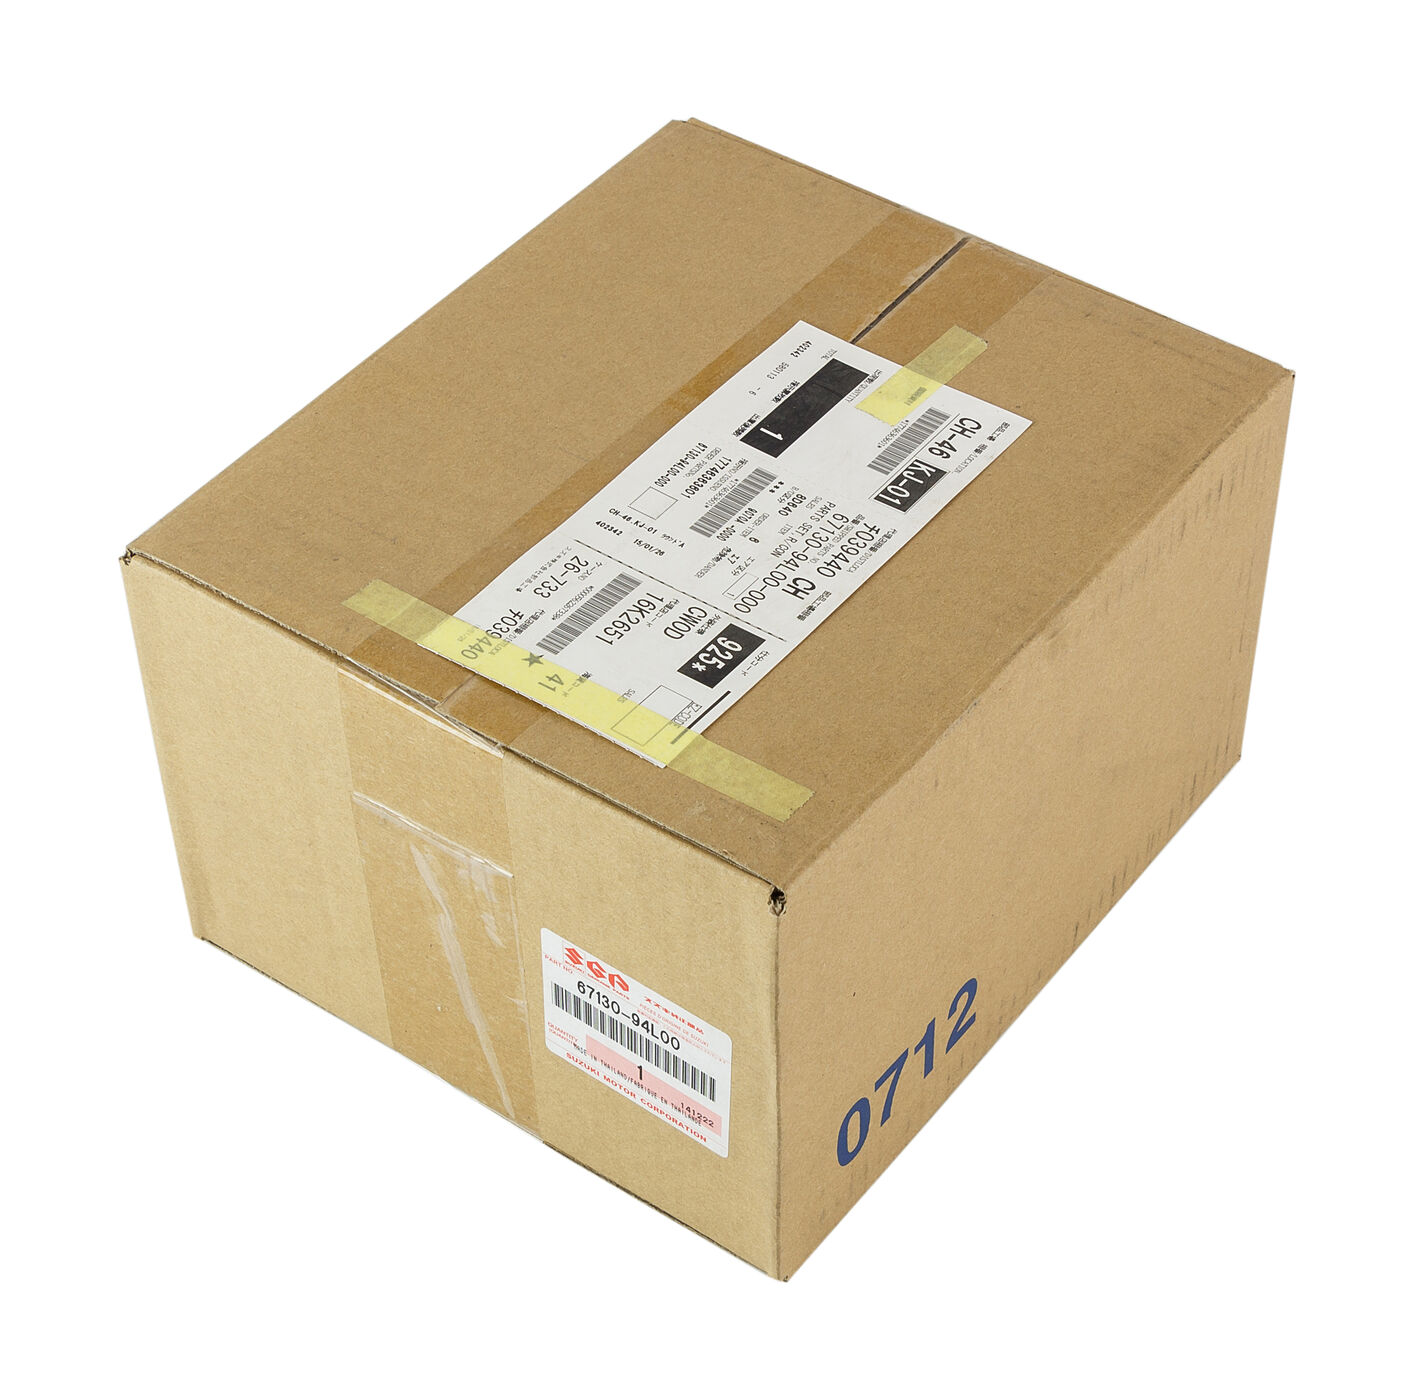 Remote control Kit for Suzuki DF25A/30A barcode